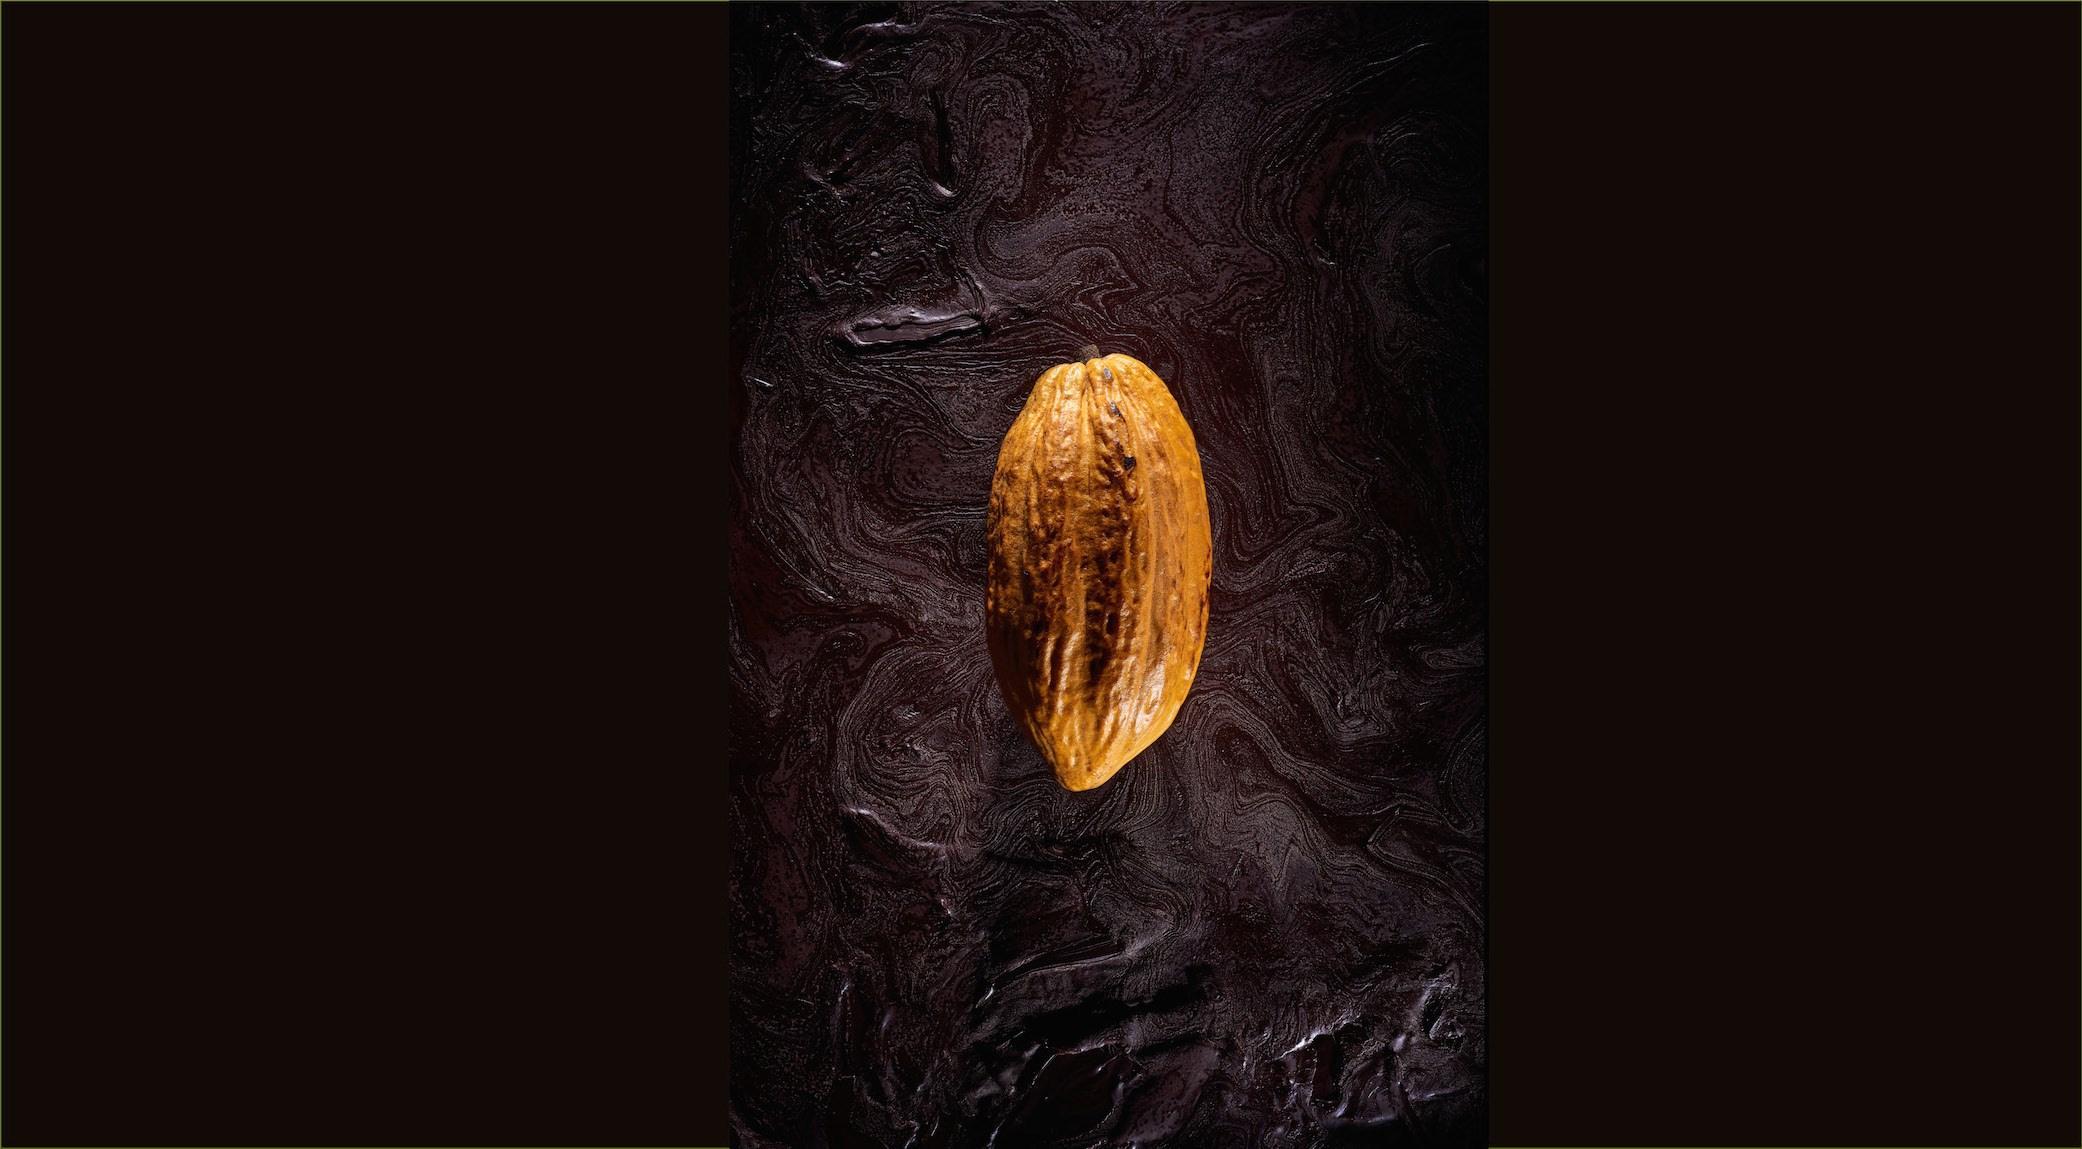 Frédéric Marr - Chocolatier - RRRAW - Montreuil